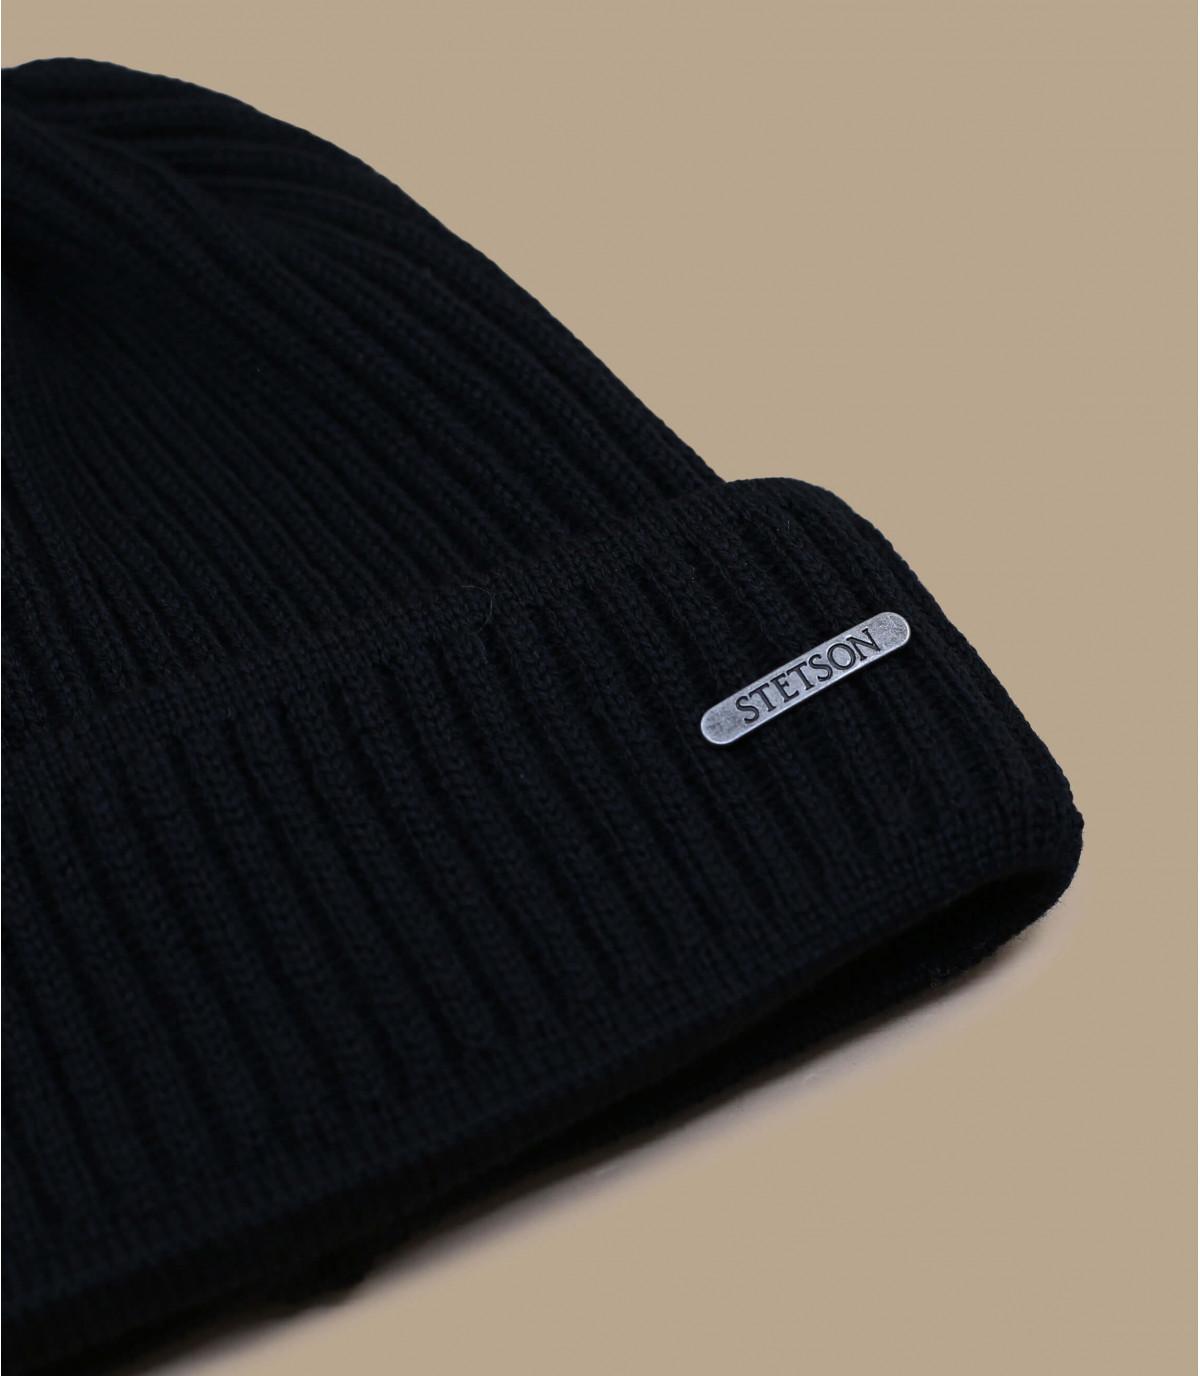 Détails beanie Merino Wool black - image 2